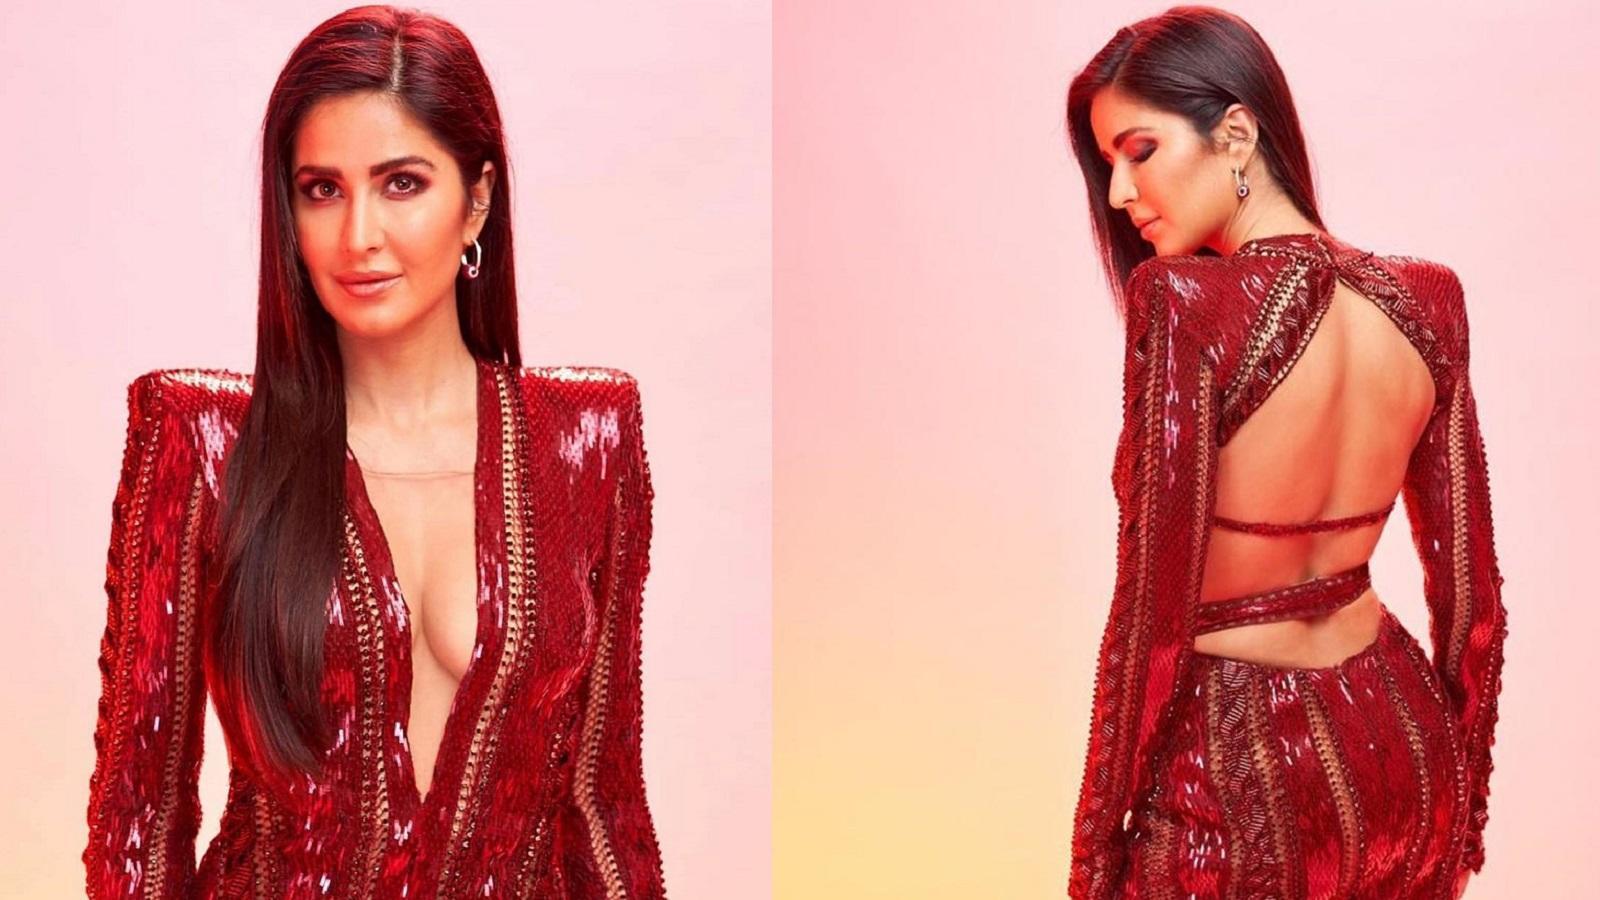 Fashion goals! Katrina Kaif looks ravishing in this maroon thigh-high slit  gown